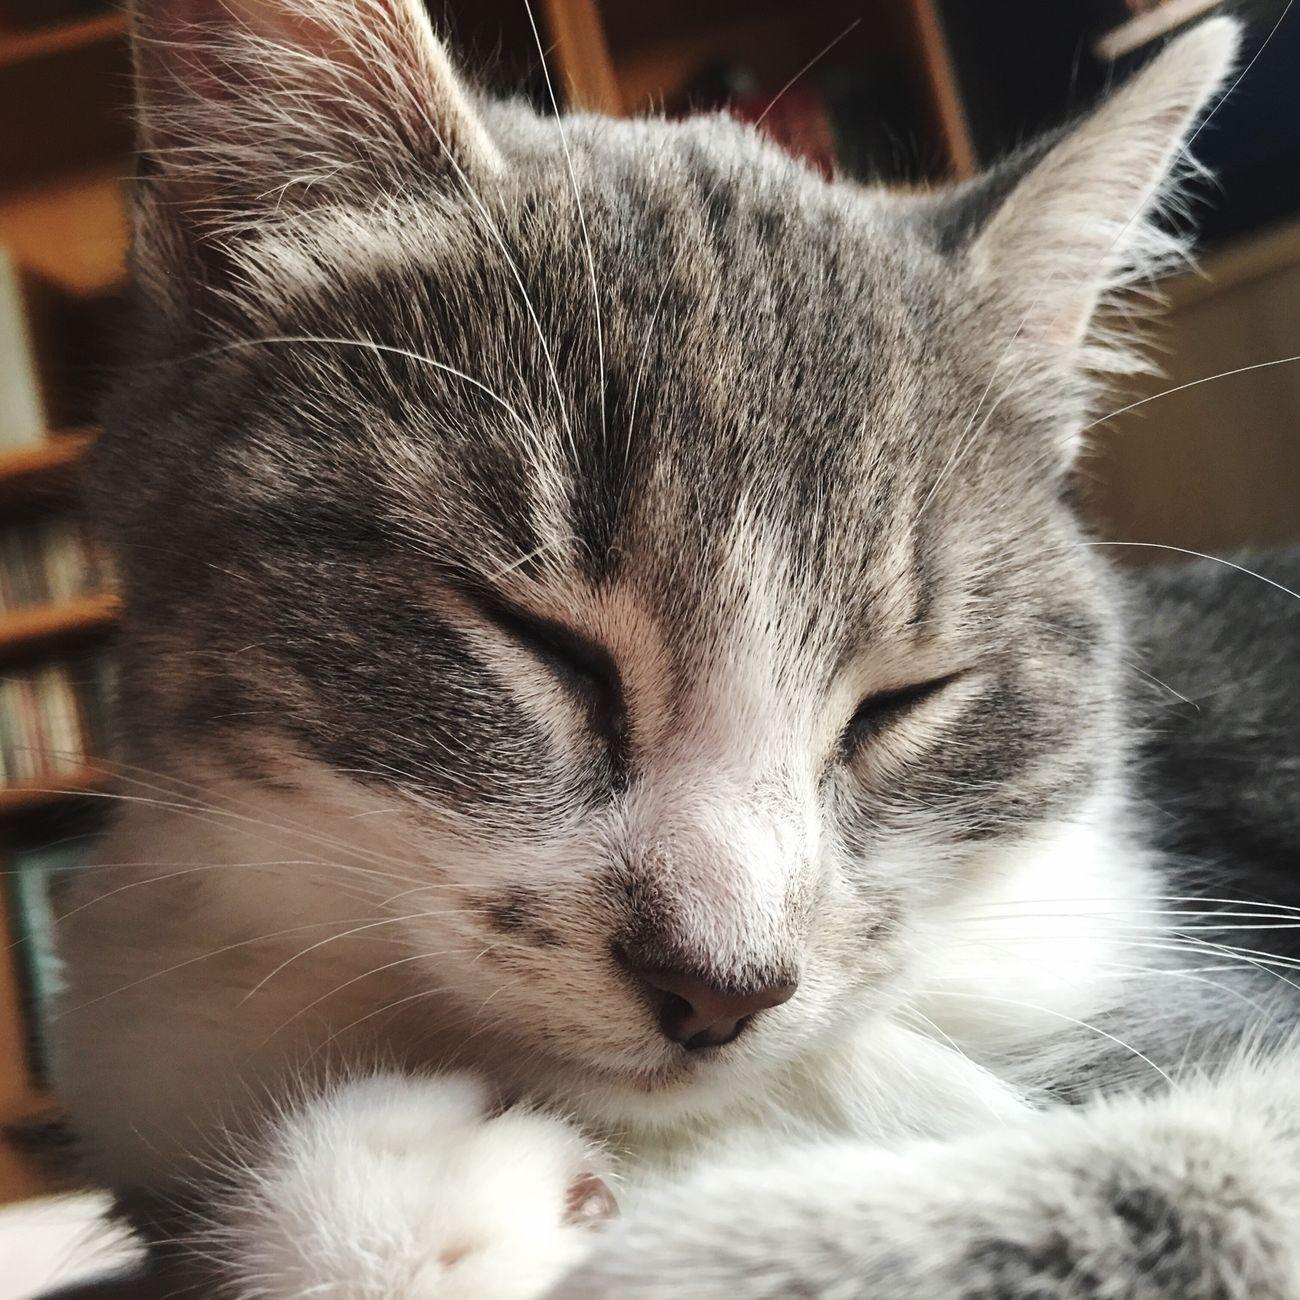 Cat Domestic Cat Pets Animal Themes Domestic Animals Chats Cute Pets Mycat Cats Of EyeEm Cute Cats Animals Love Chaton Baby One Animal Cute Cats Animal Chat Babycat